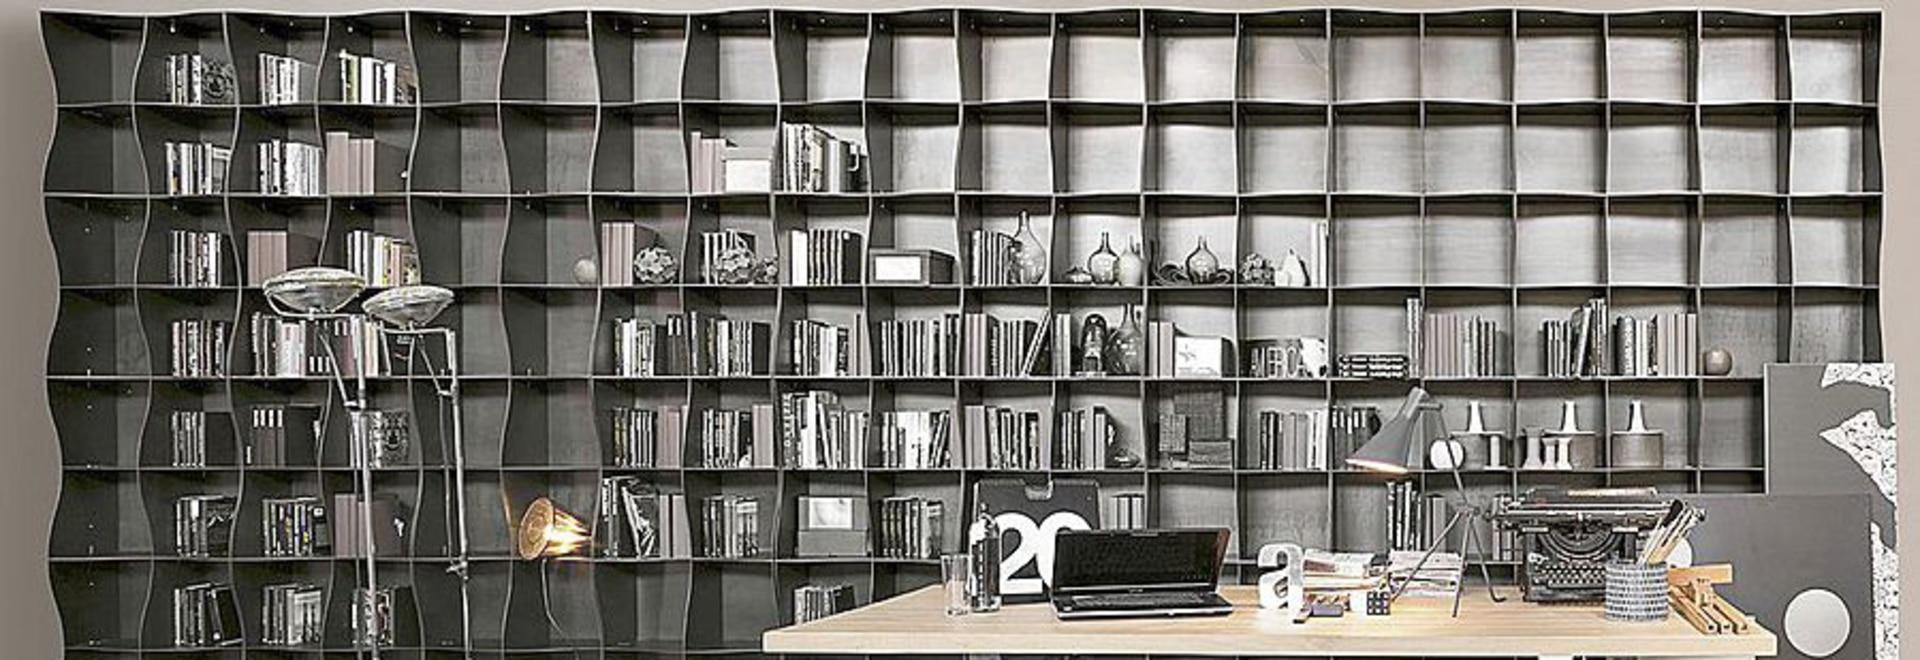 Biblioth Que Modulaire Ironique En M Tal Italy Ronda Design # Bibliotheque Modulaire